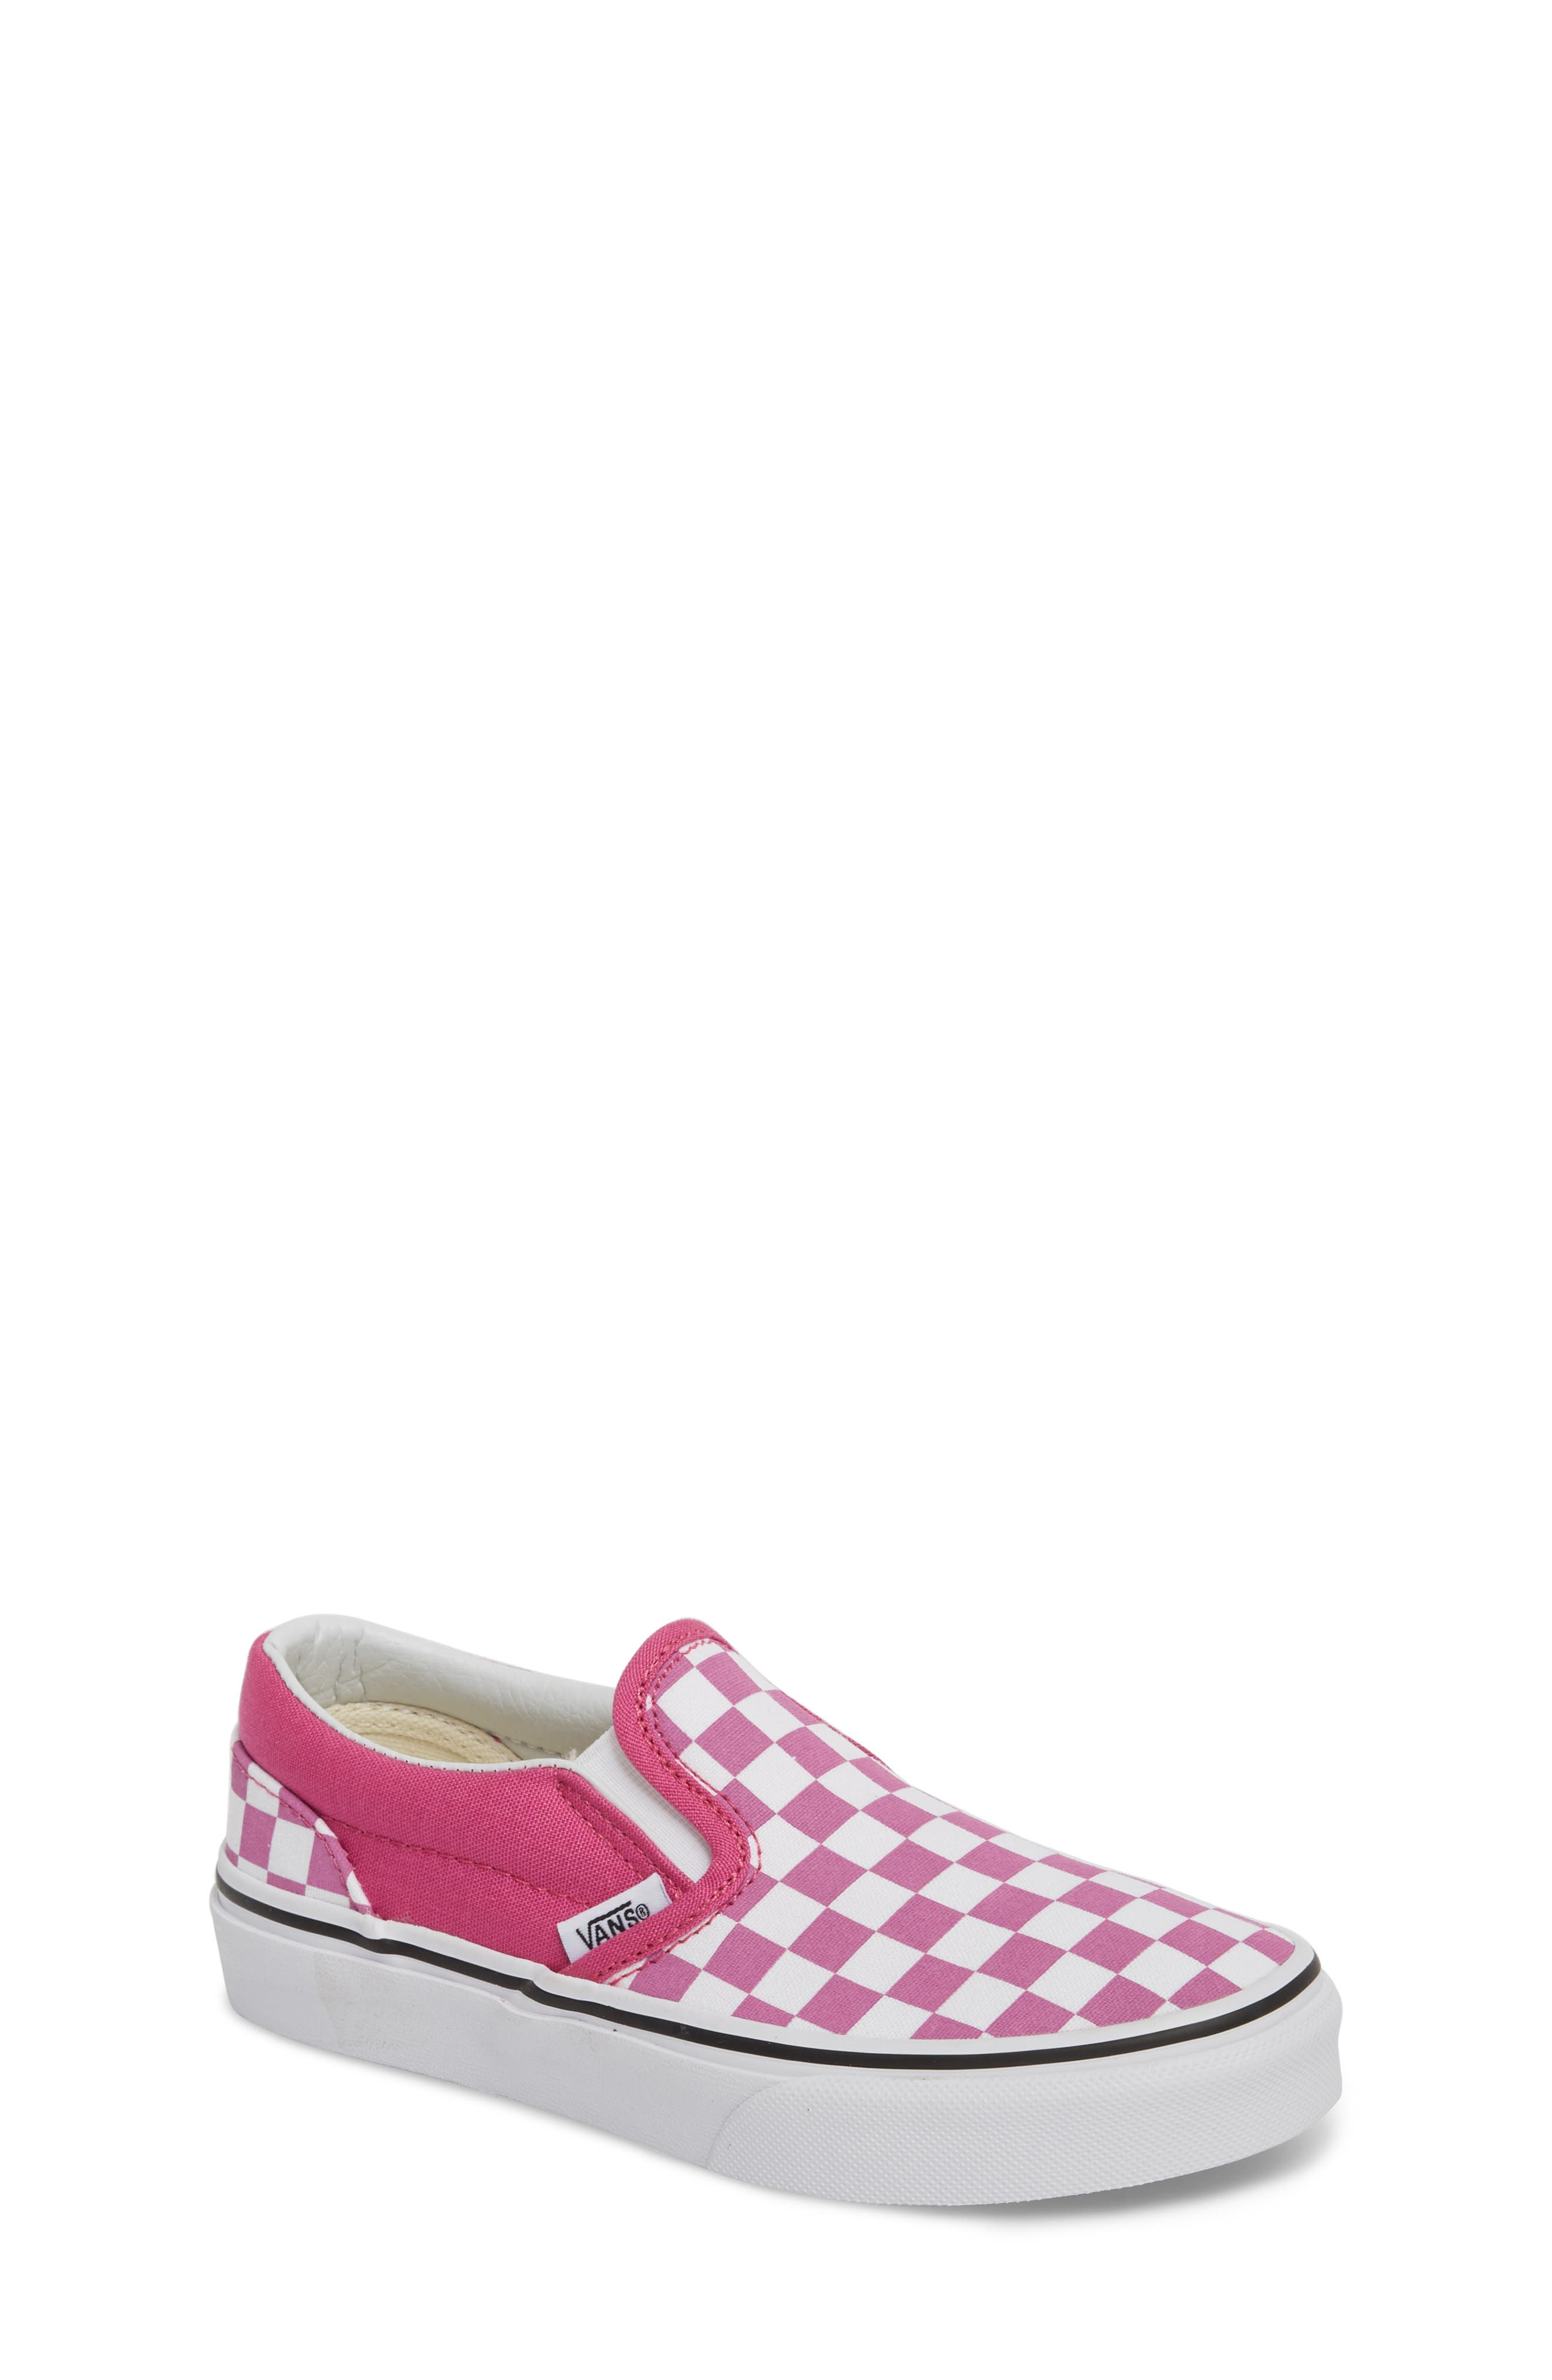 'Classic - Checkerboard' Slip-On,                             Main thumbnail 1, color,                             Rose/ White Checkerboard